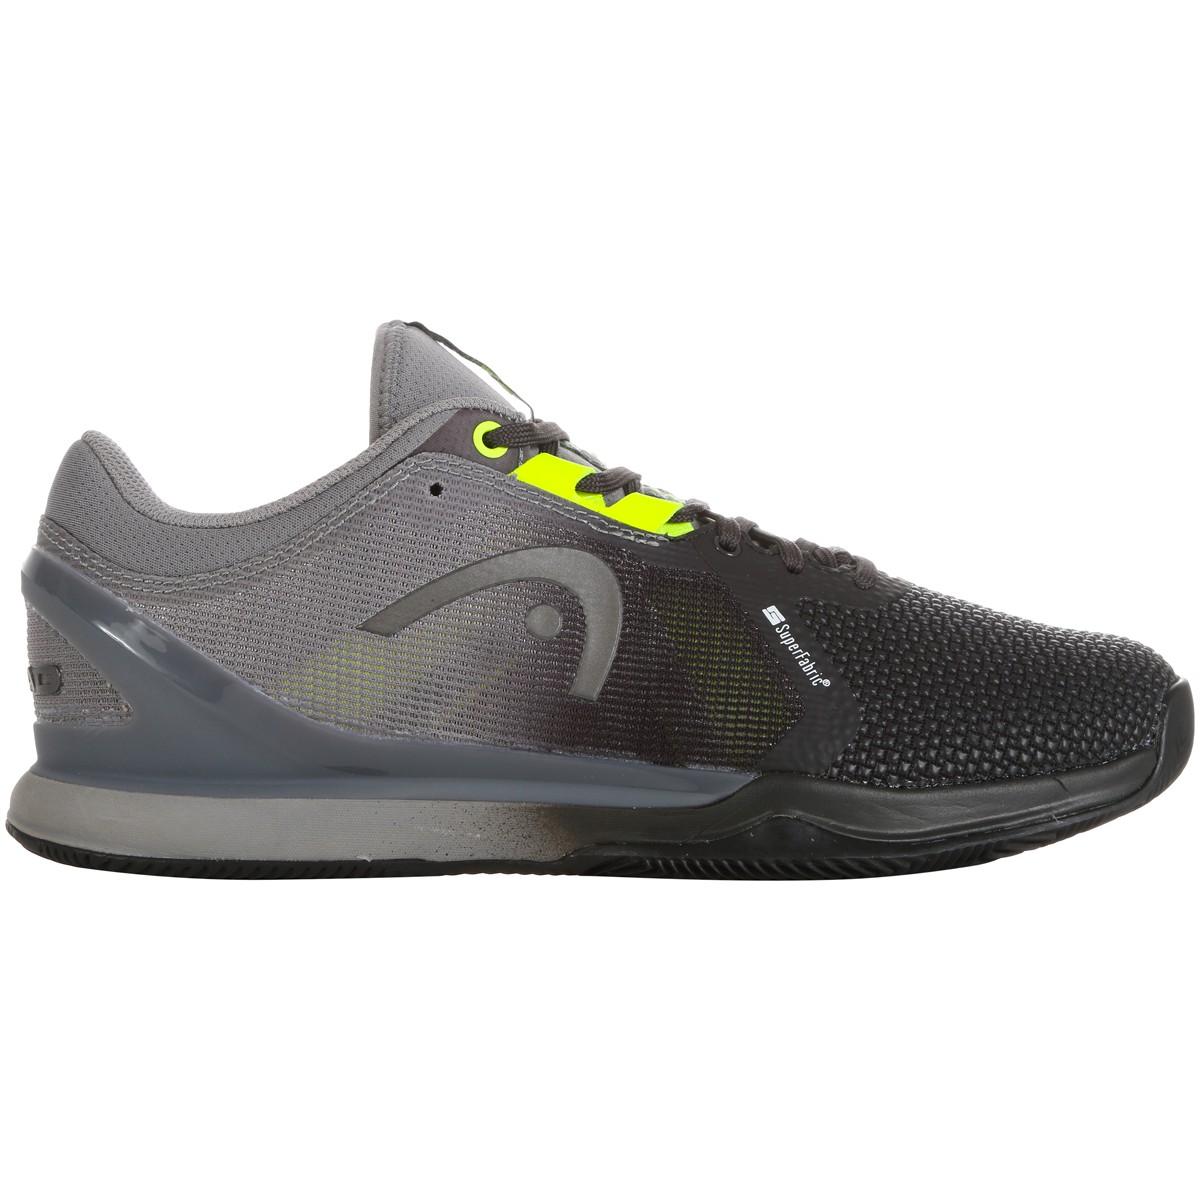 Chaussures head sprint pro 3.0 sf terre battue